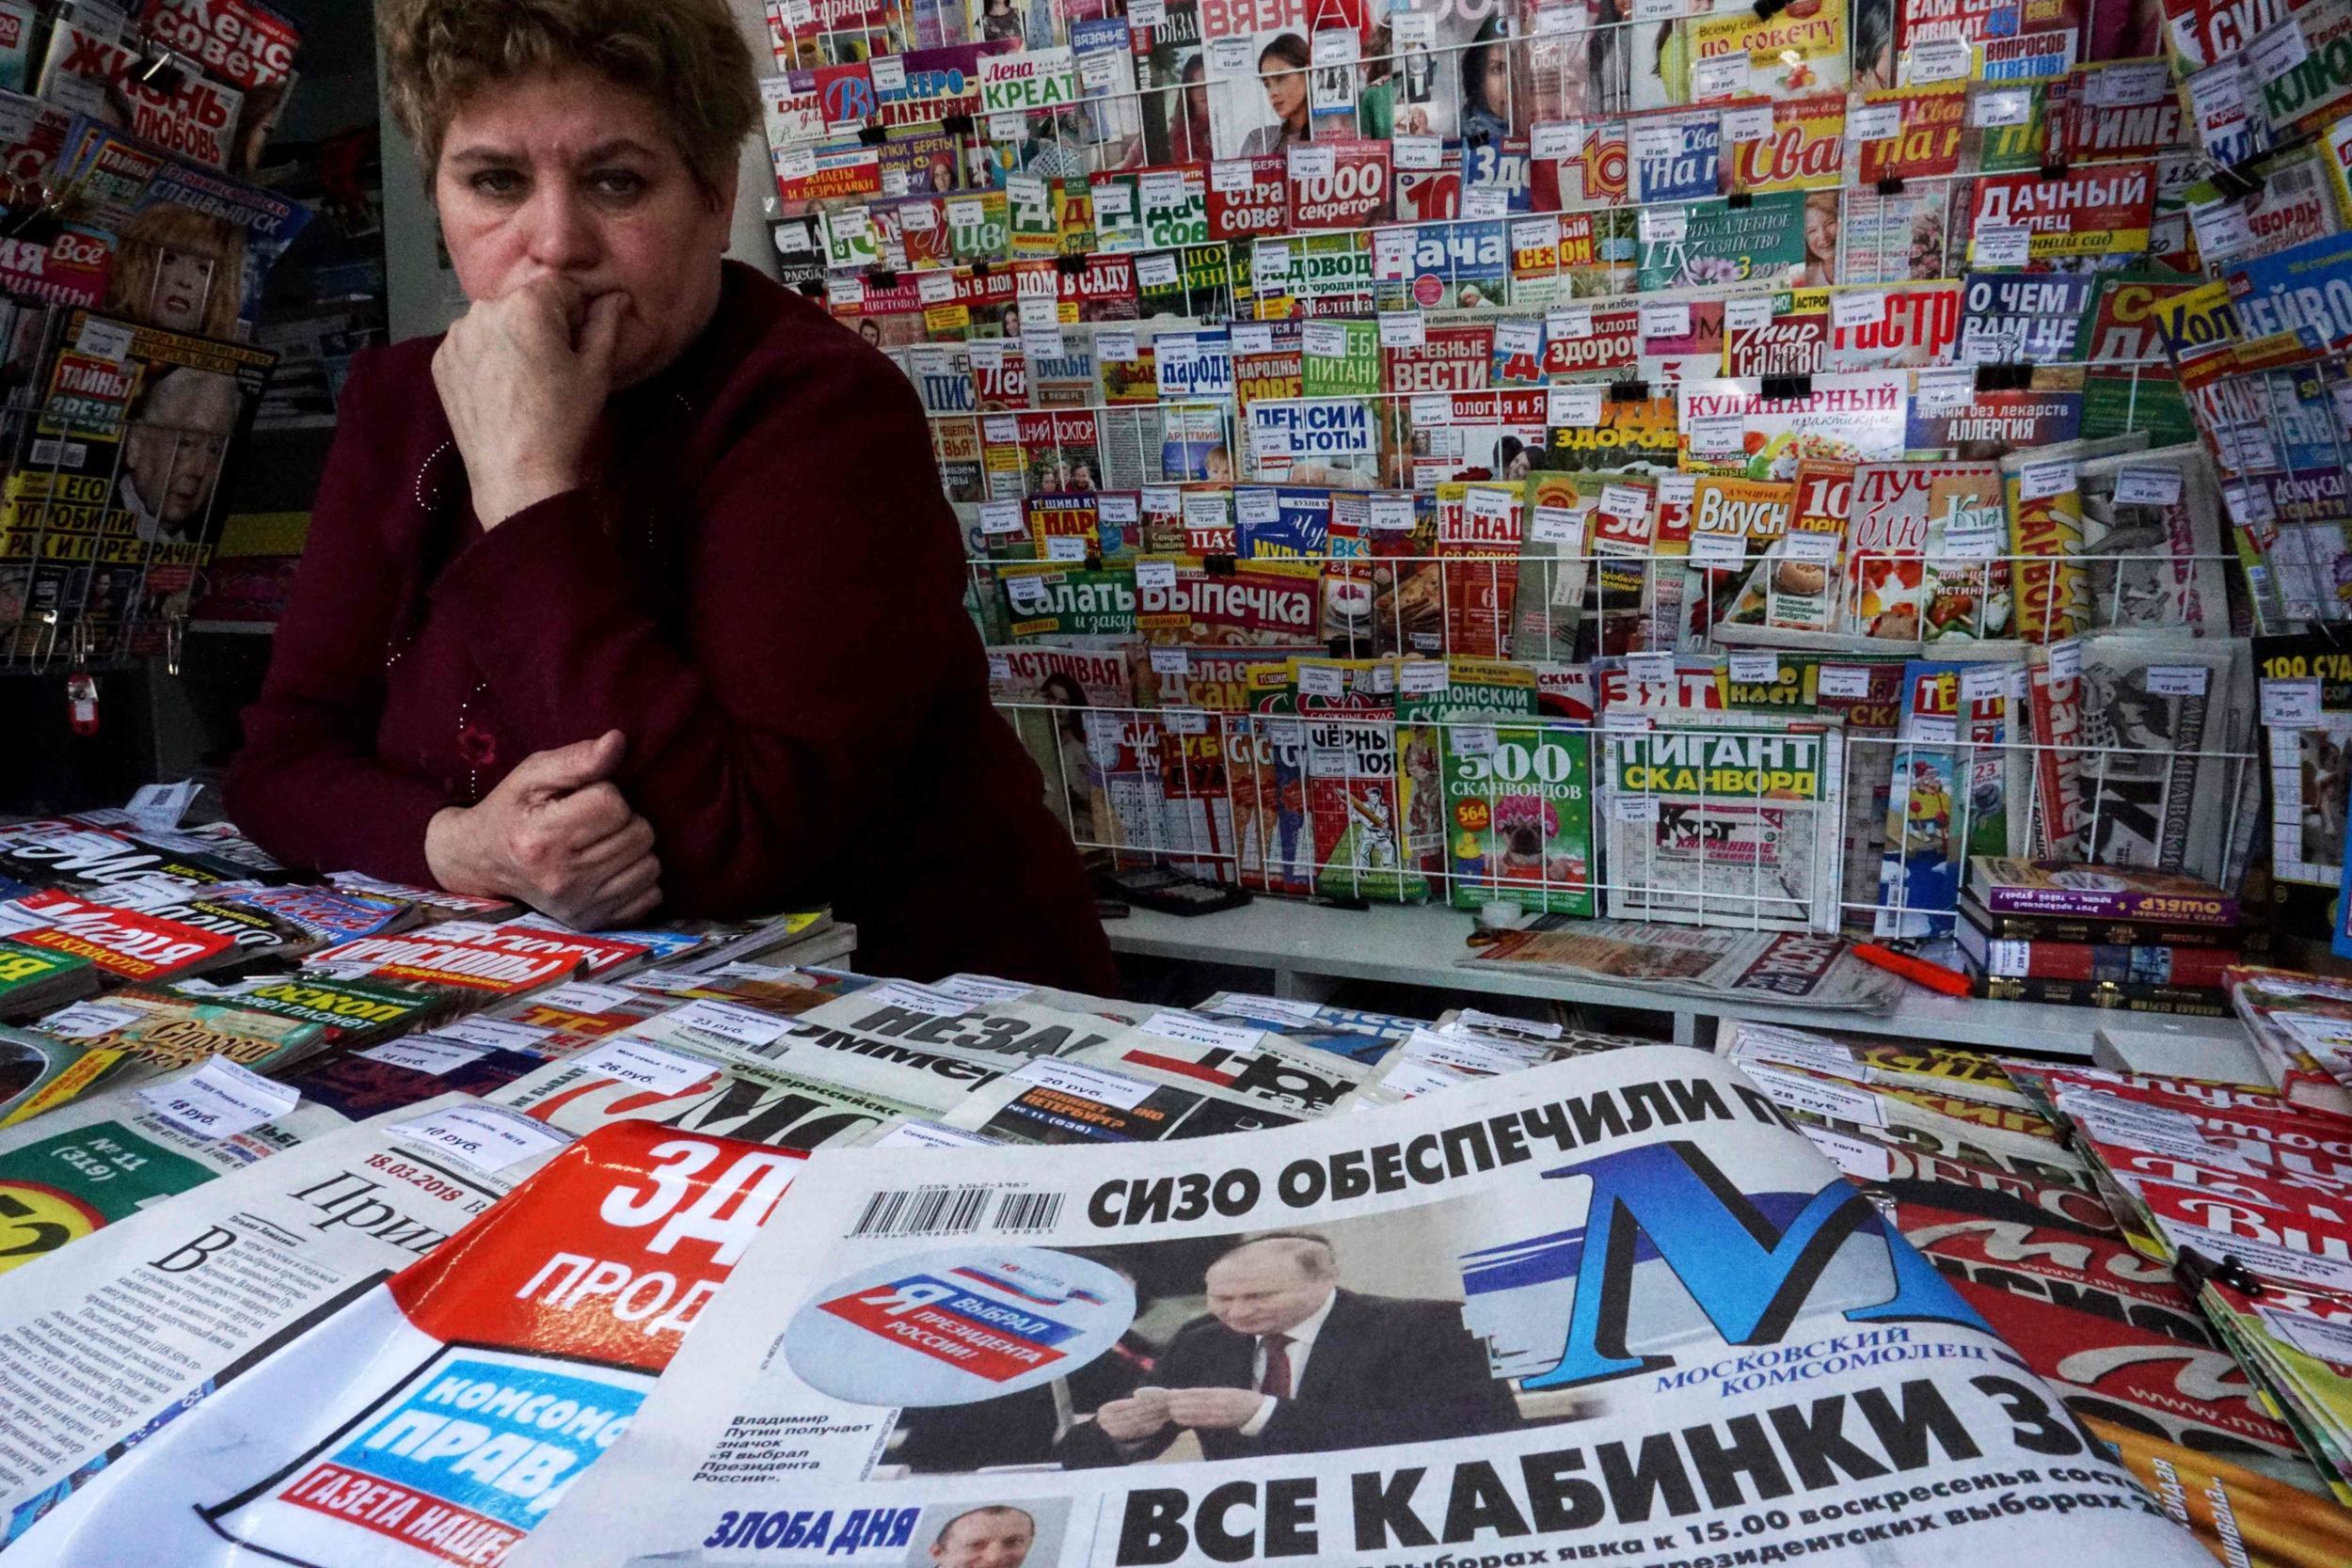 Western leaders quiet as Putin celebrates landslide election victory